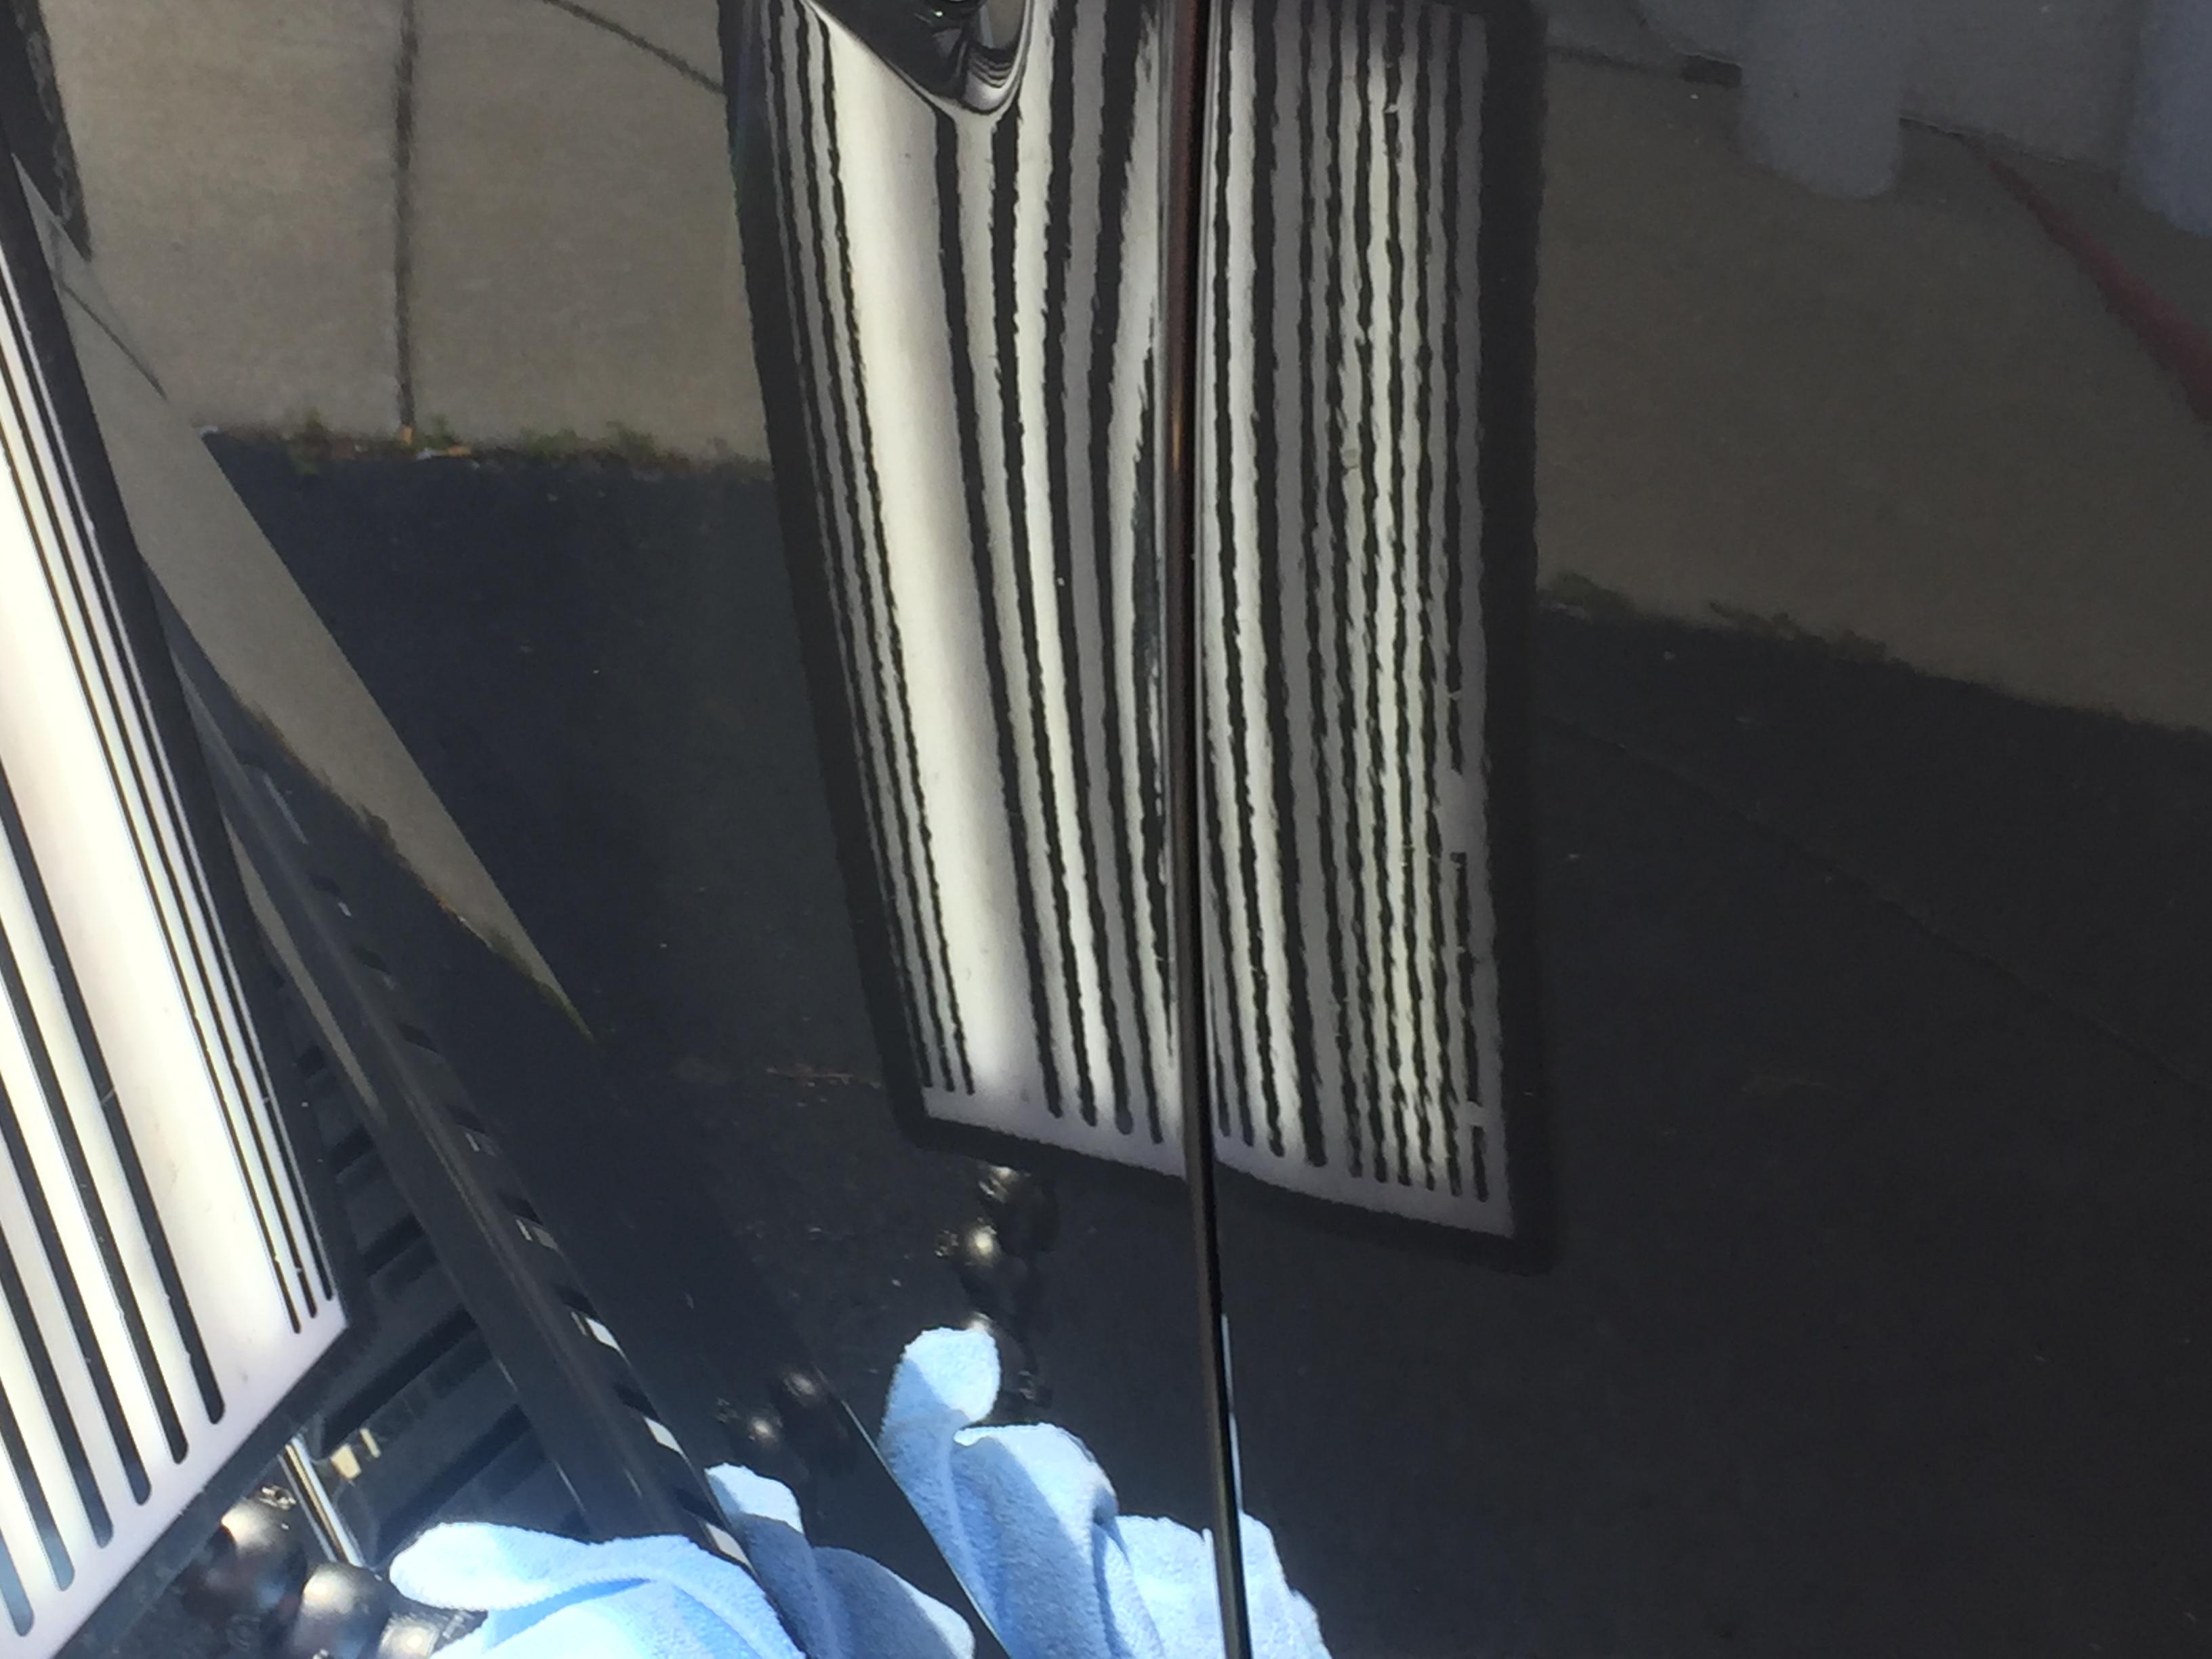 www.217dent.com 2015 Grey Aluminum Ford F-150 driver's side door dent removal near door-handle.